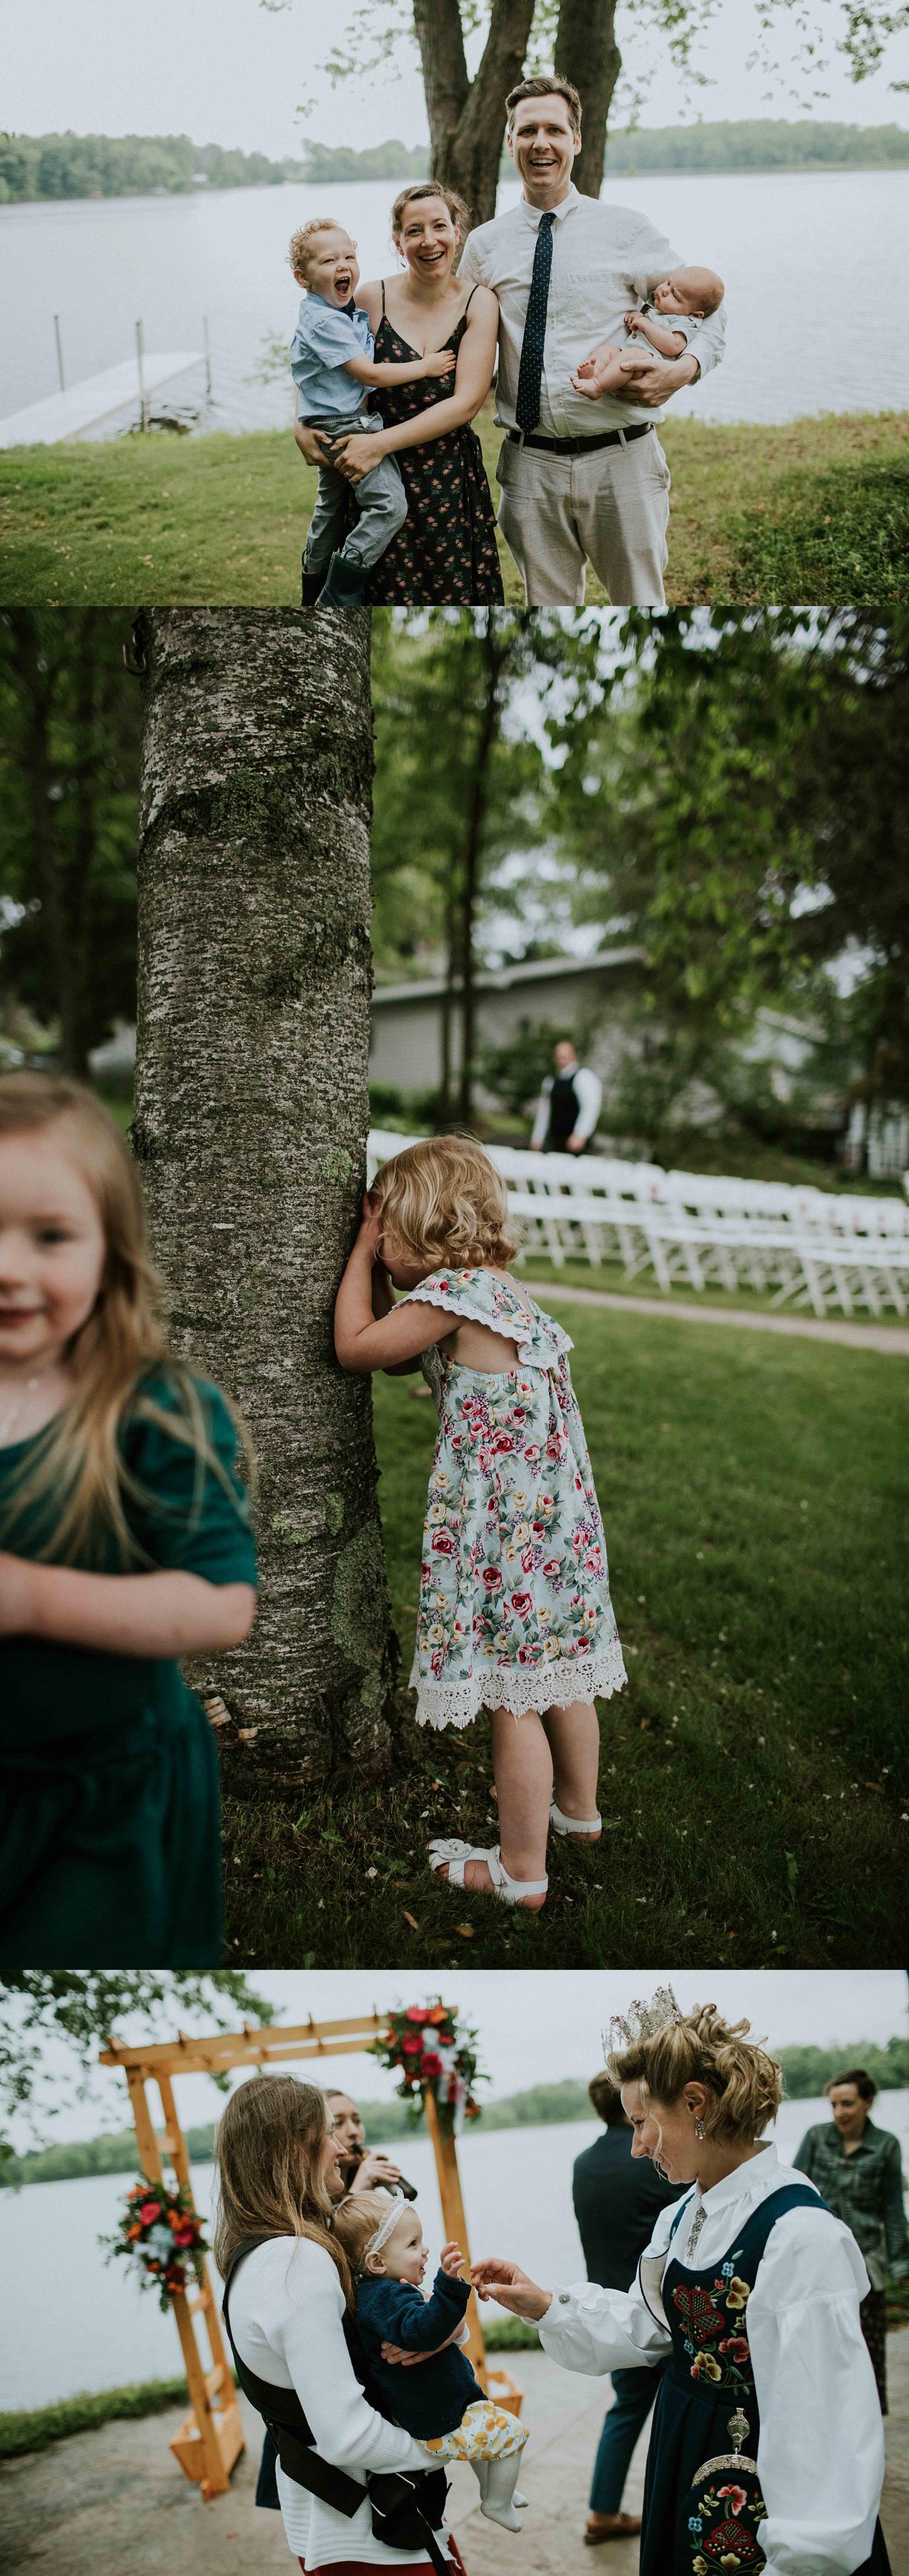 Norwegian Wedding Stevens Point Wisconsin Wedding Photographer Chloe Ann Photography_0030.jpg